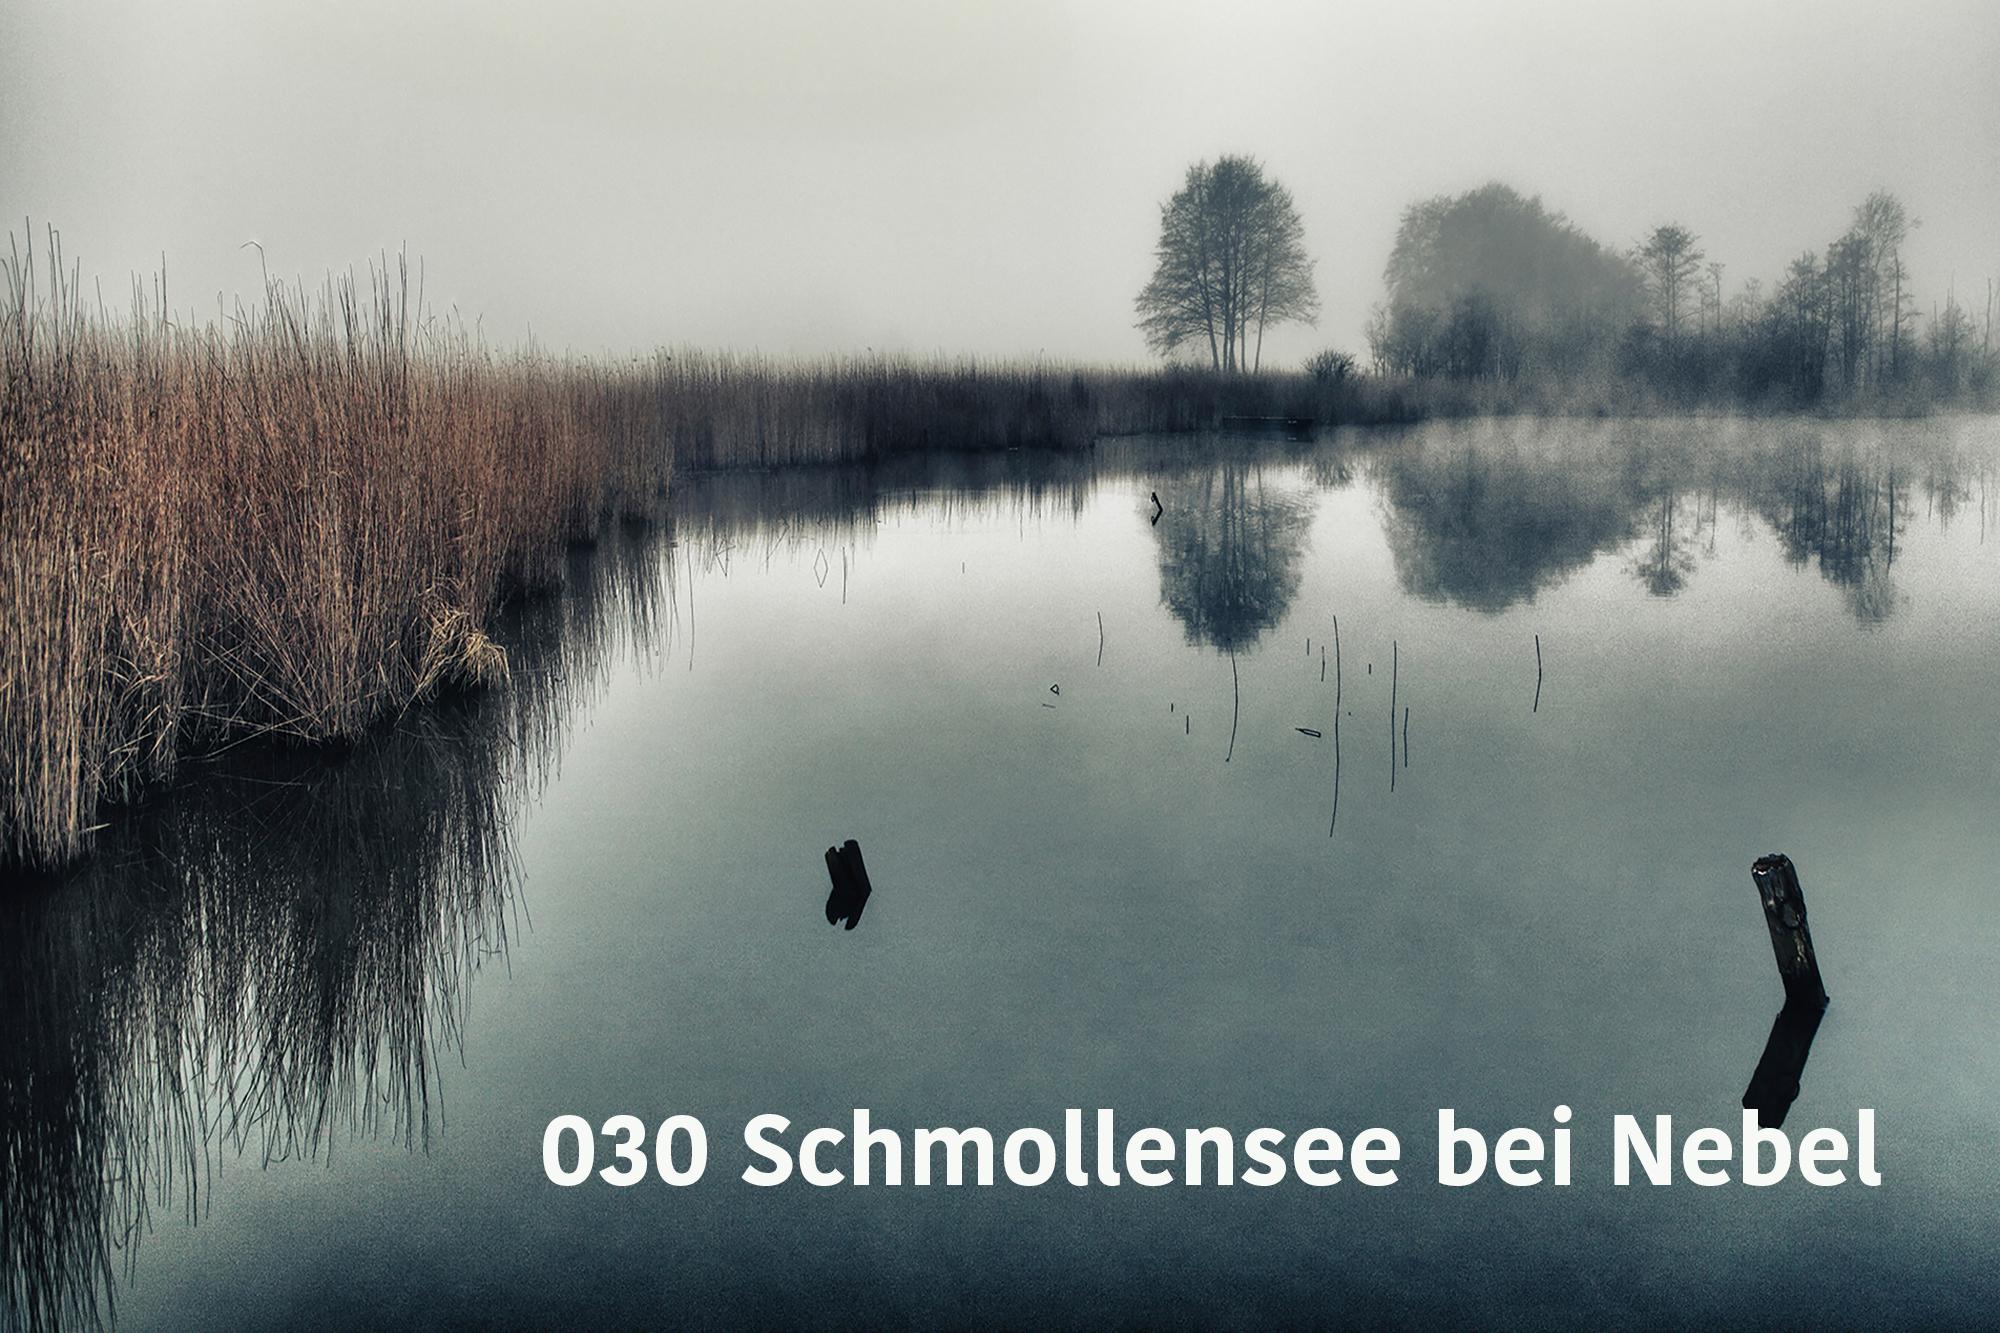 Usedom Motive (2) Canvasleinwanddruck auf Keilrahmen 80 x 120 cm